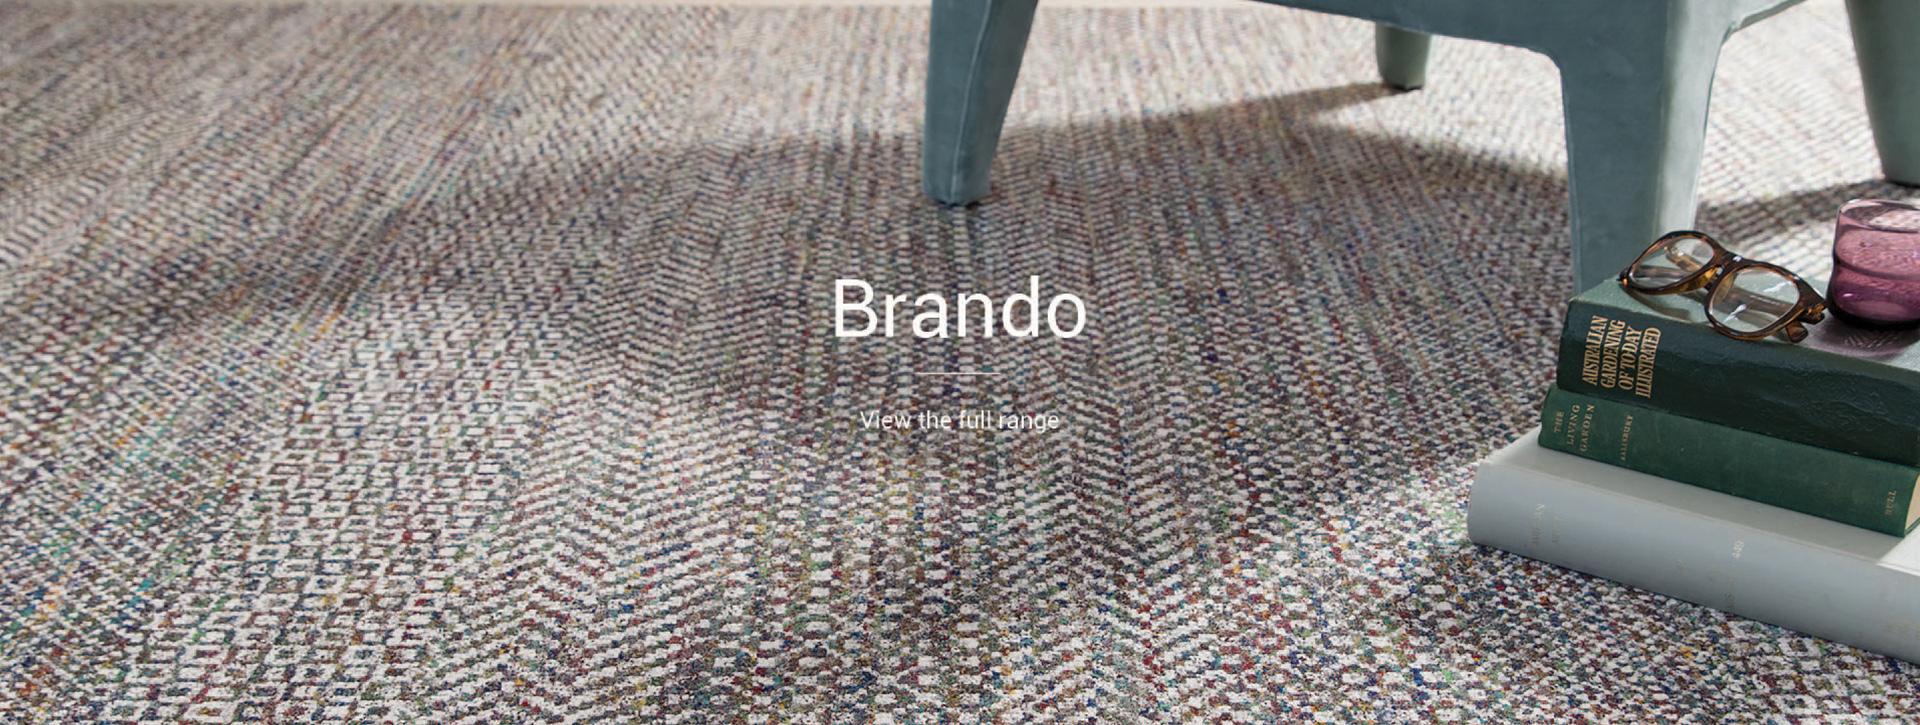 Brando Main Banner